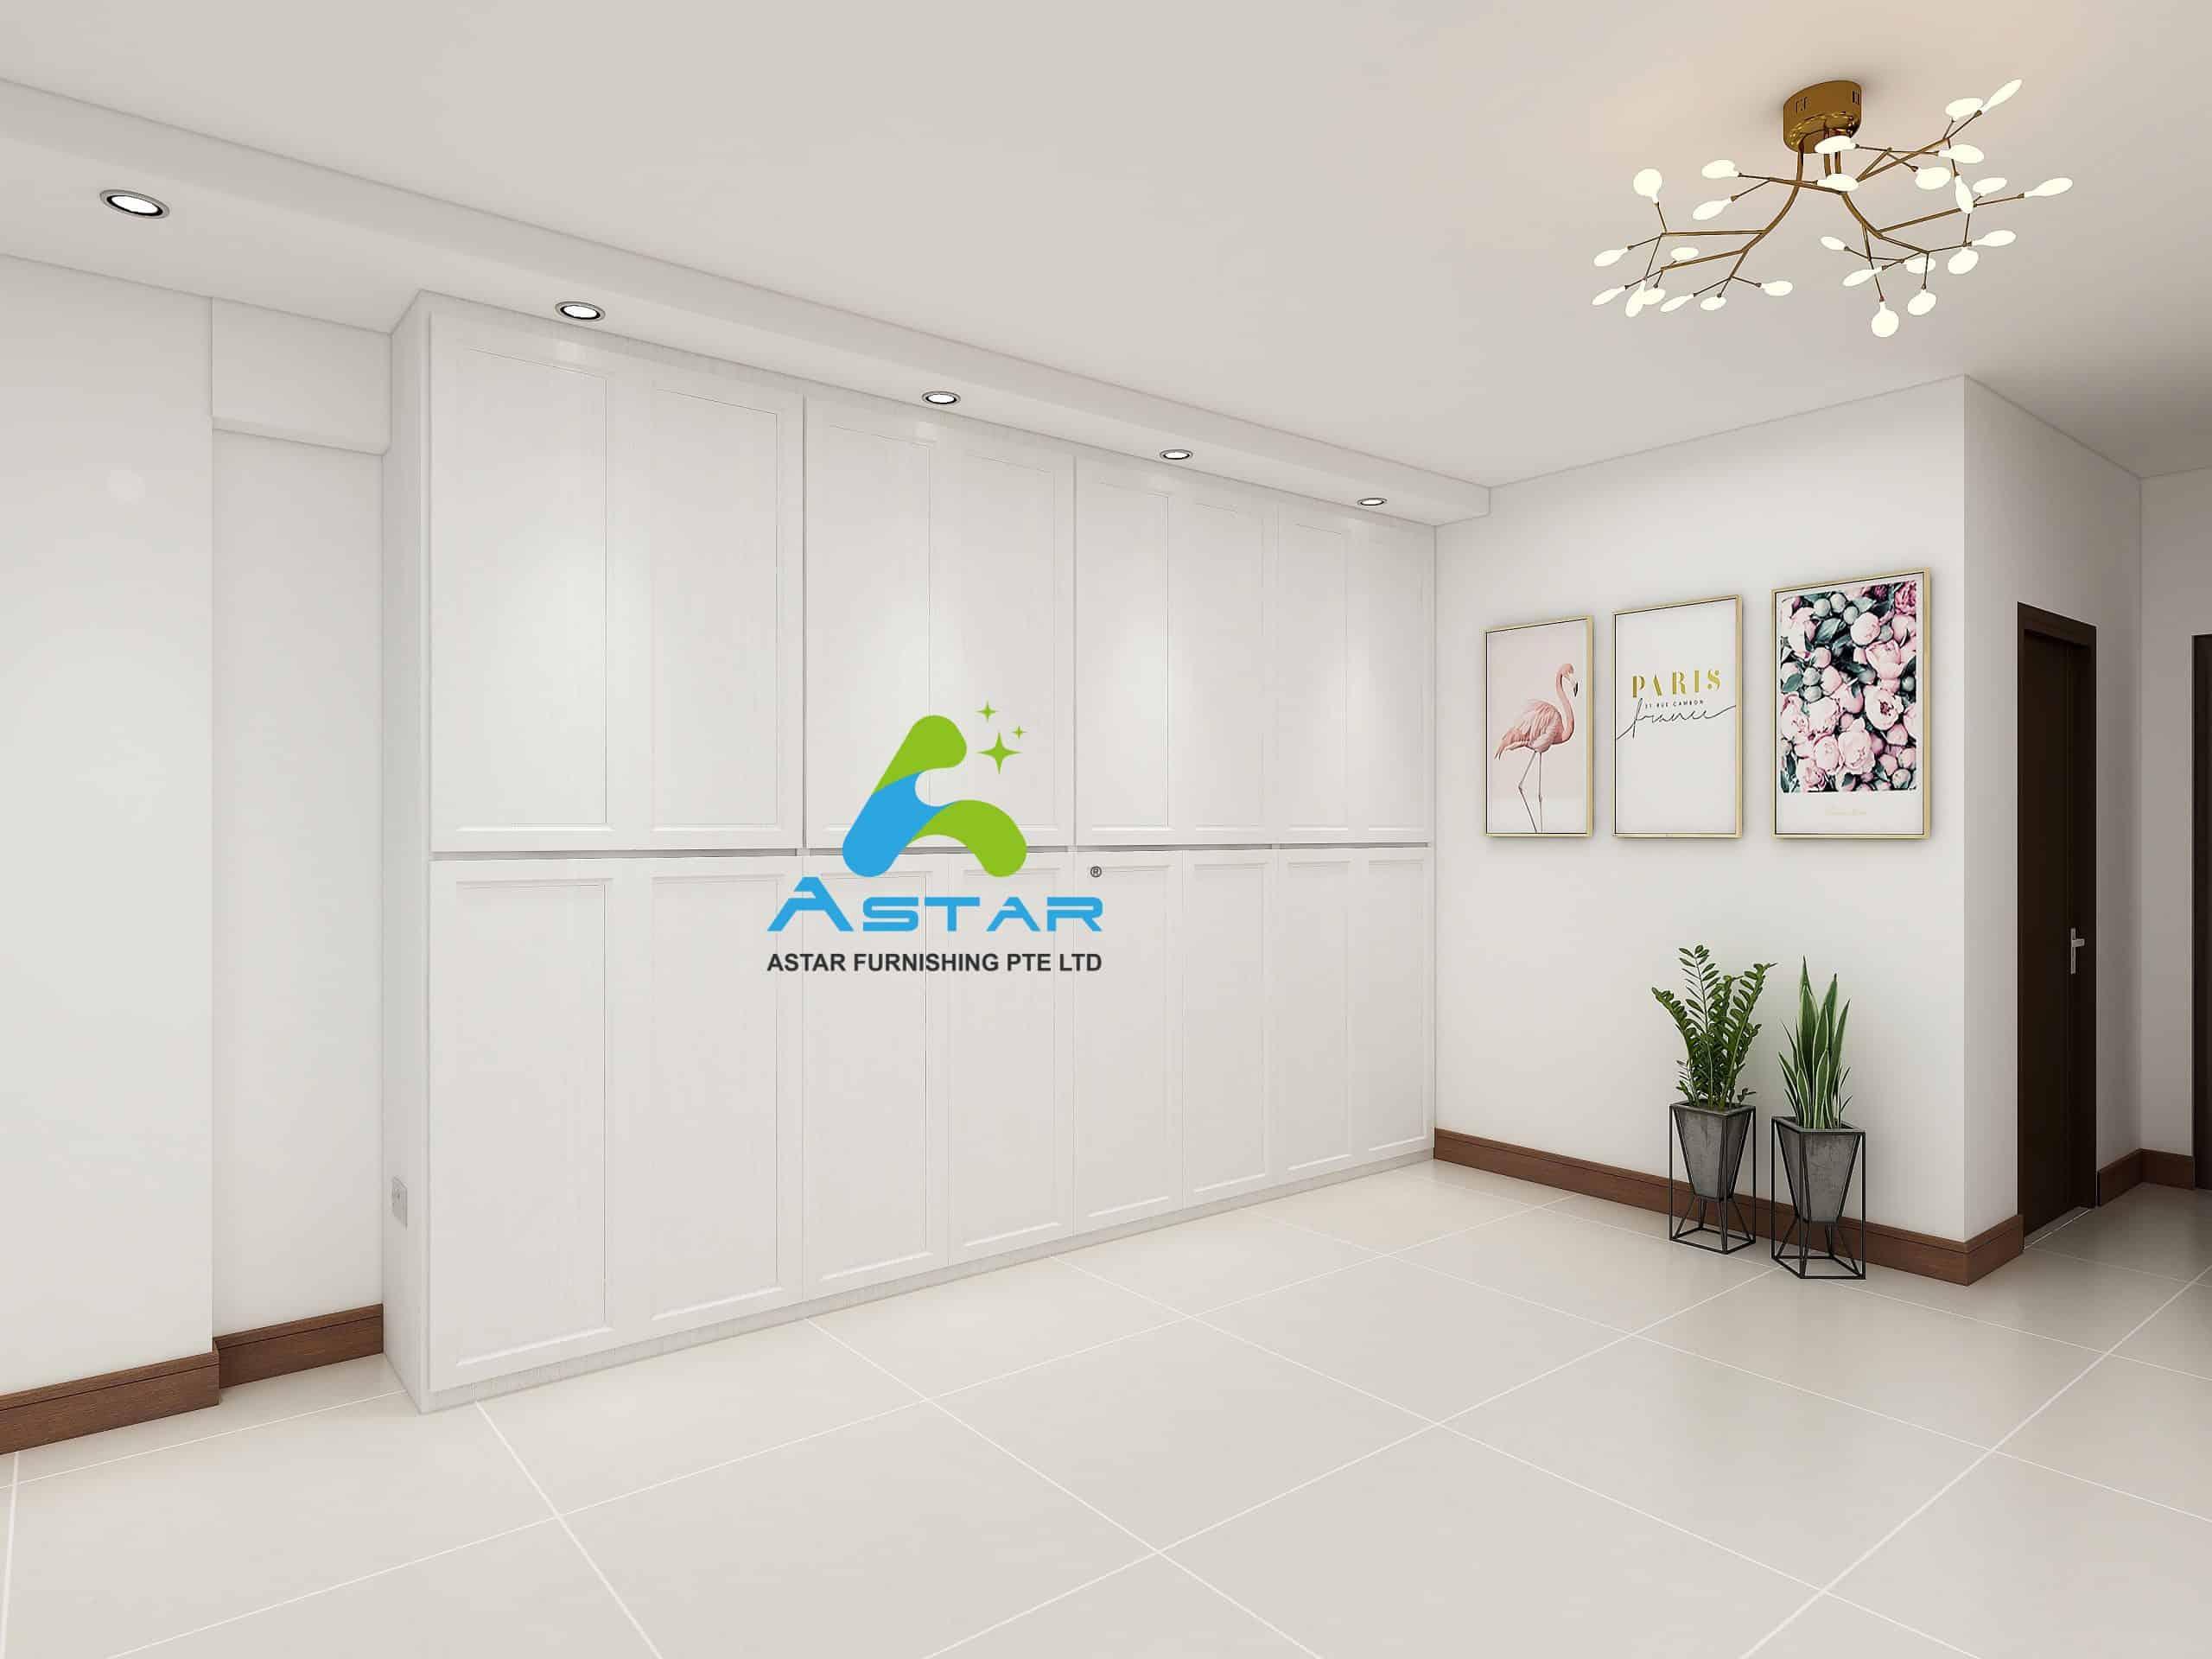 a star furnishing aluminium projects 12. Blk 325B Sumang Walk 059 scaled